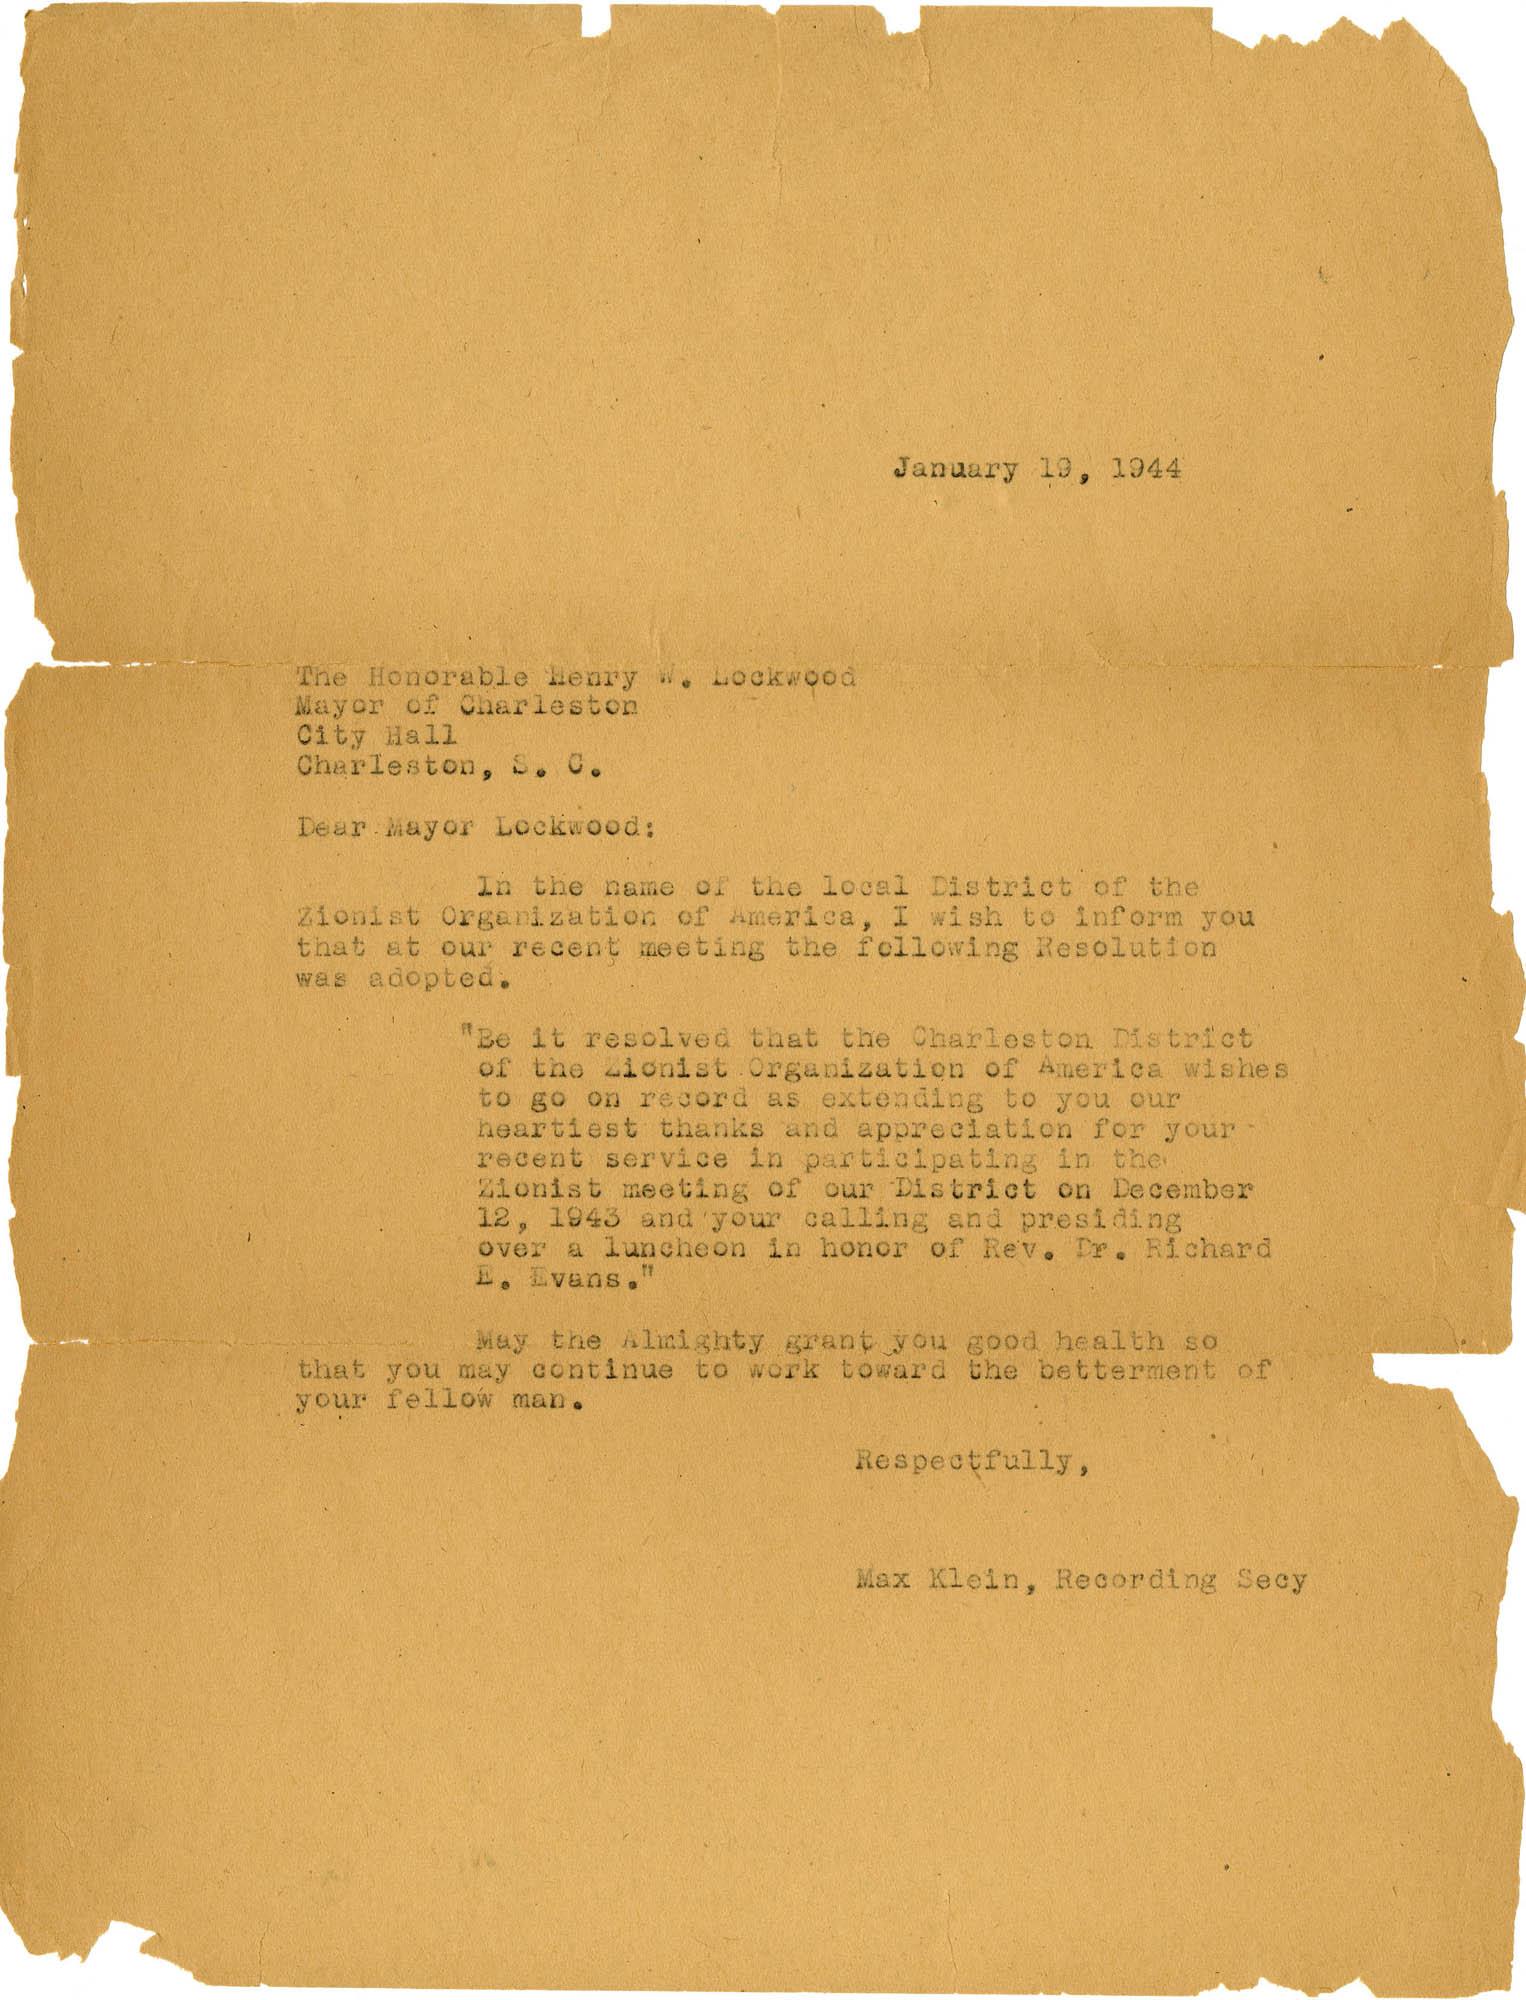 18. Letter to Mayor Lockwood